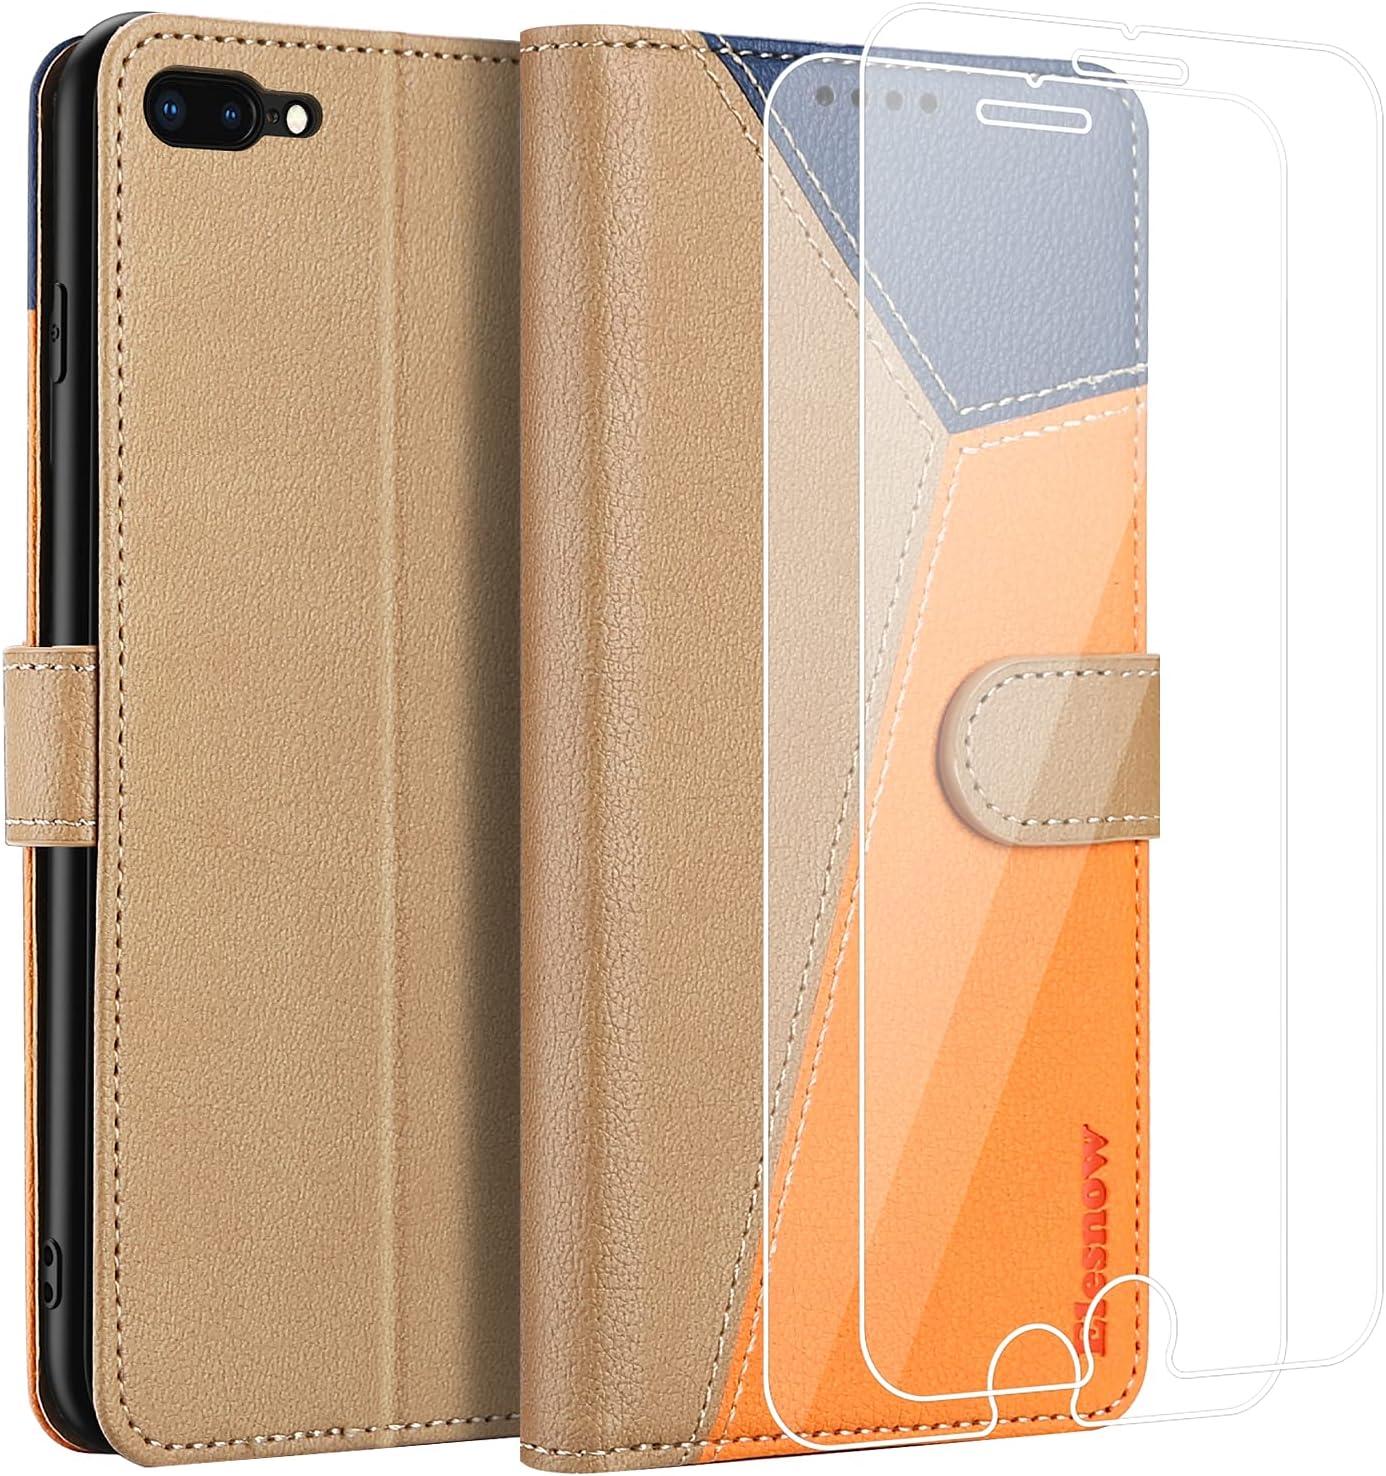 ELESNOW Funda para iPhone 7 Plus / 8 Plus con [Templado Protector de Pantalla] Carcasa Magnética Tarjetero Tapa de Cuero para Apple iPhone 7 Plus / 8 Plus - 5.5